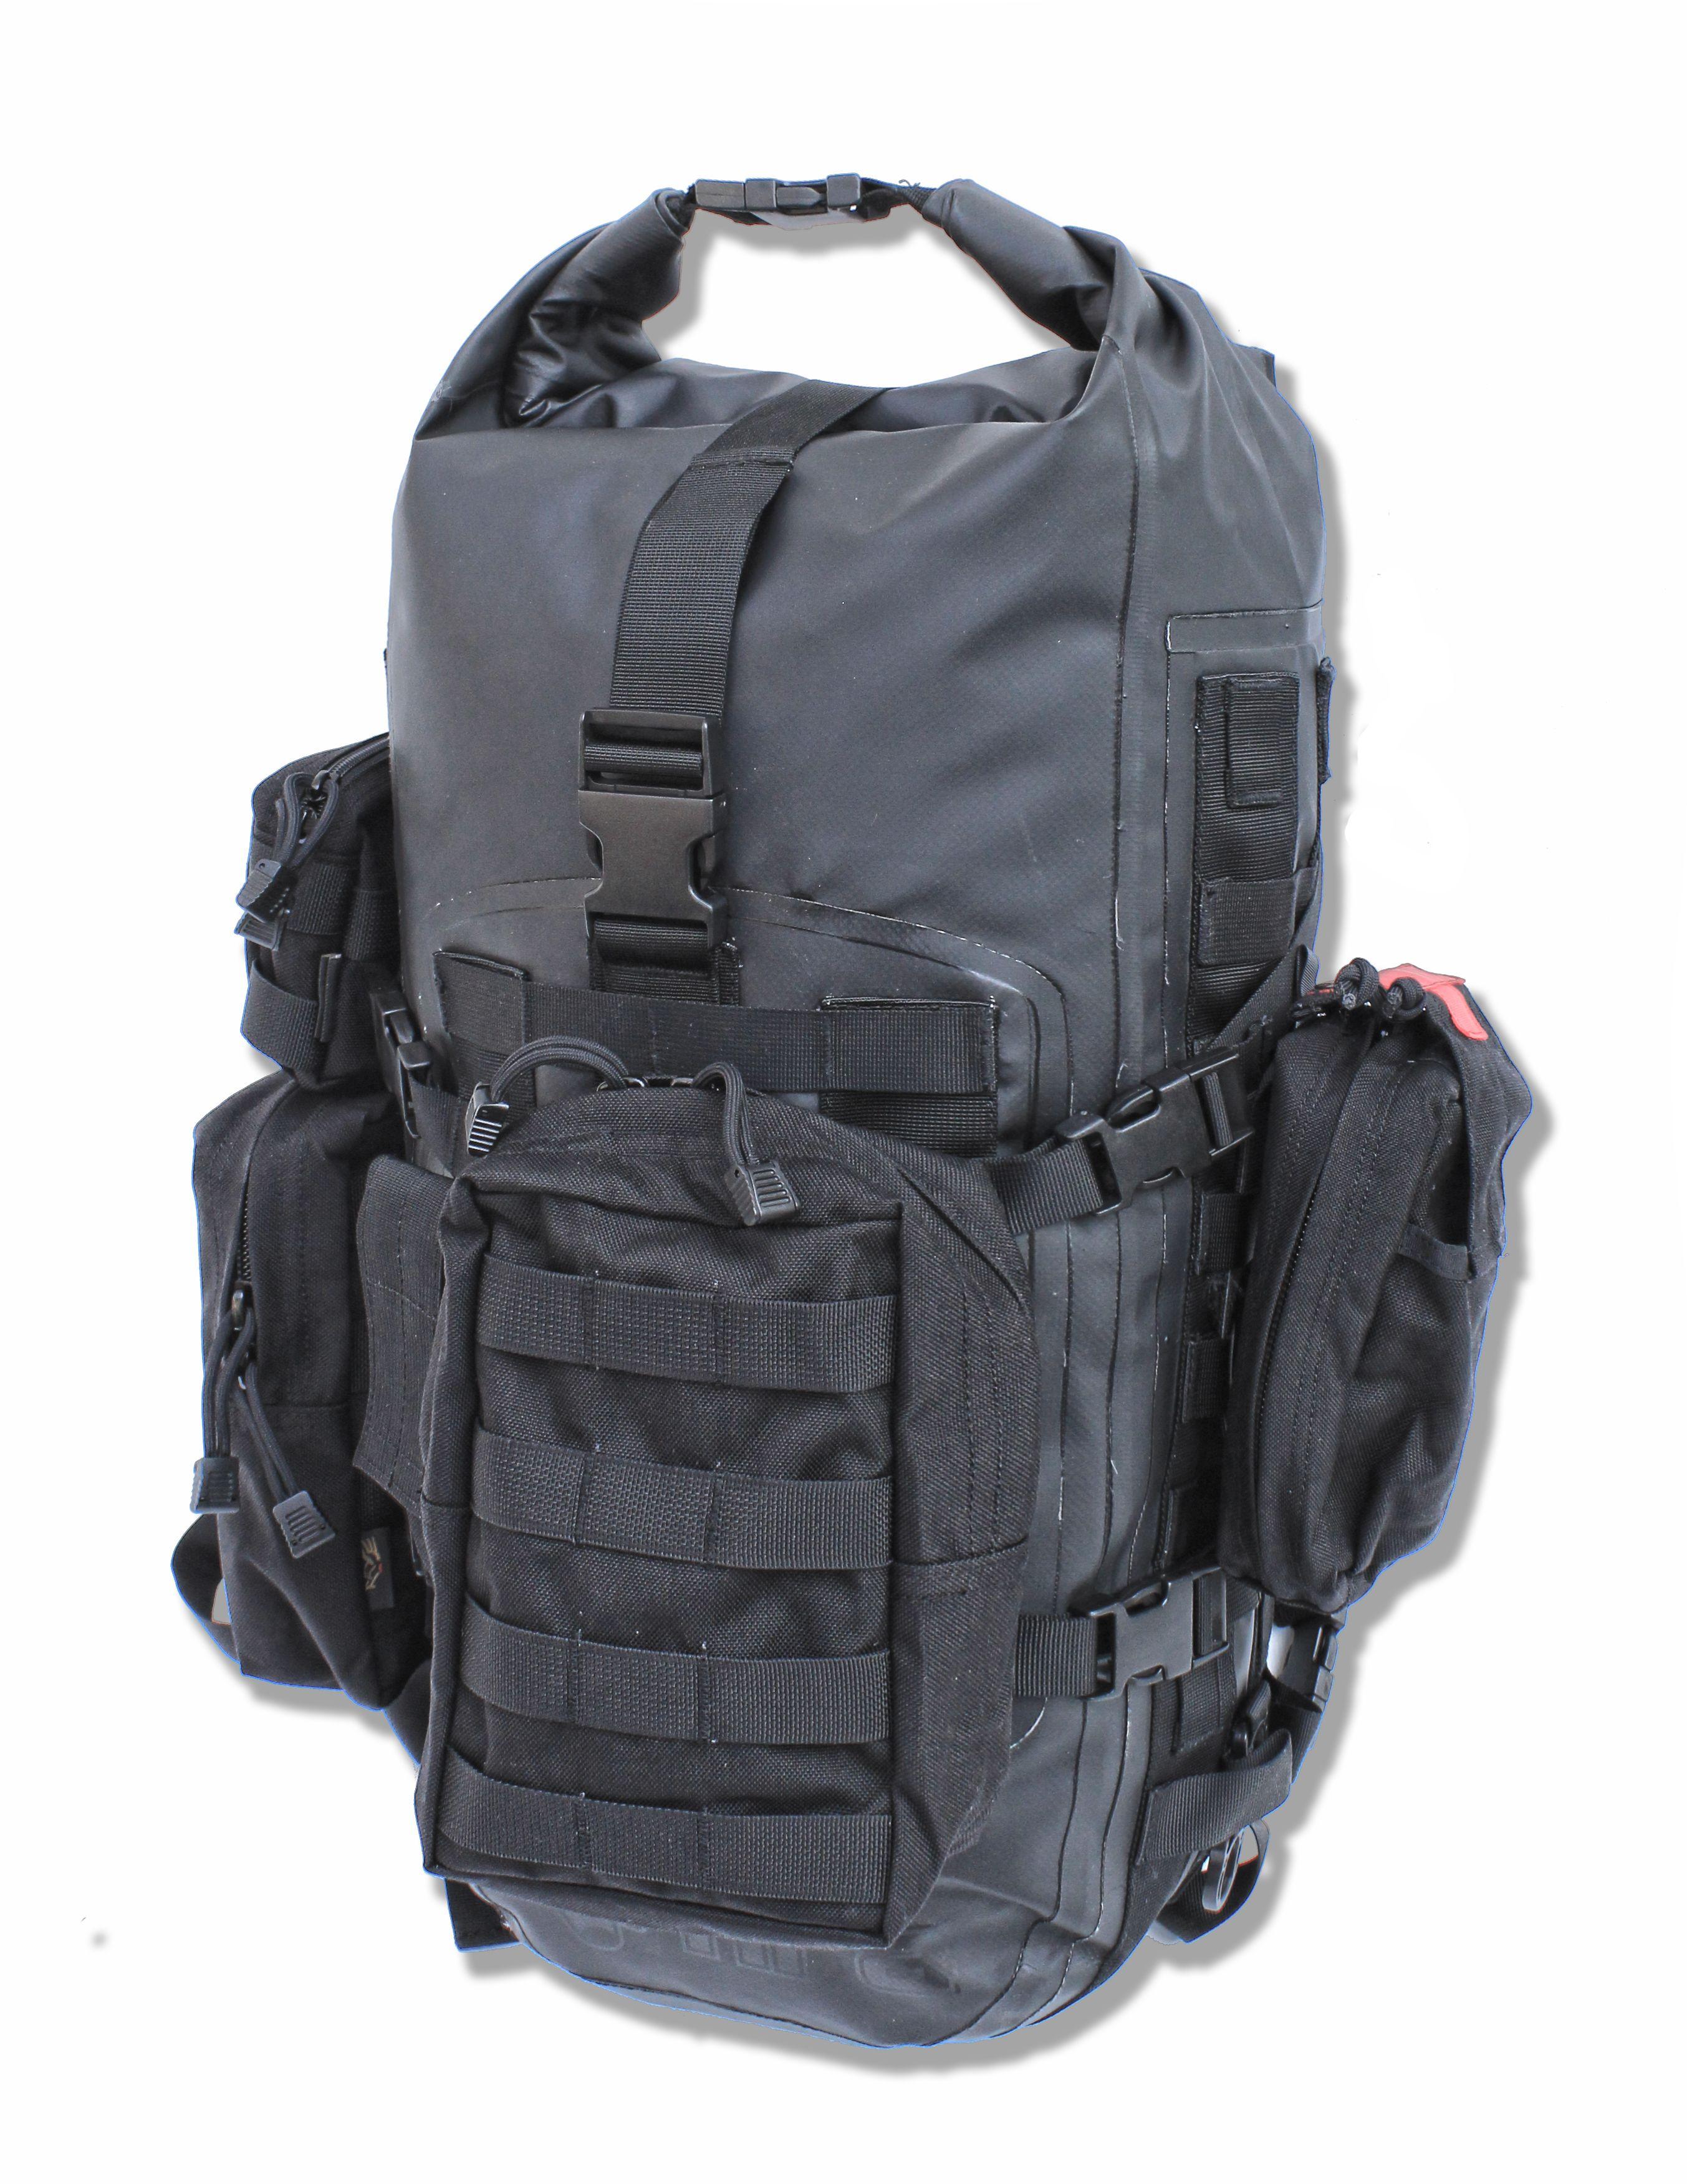 M.O.L.L.E waterproof backpack | BoB | Pinterest | Waterproof ...